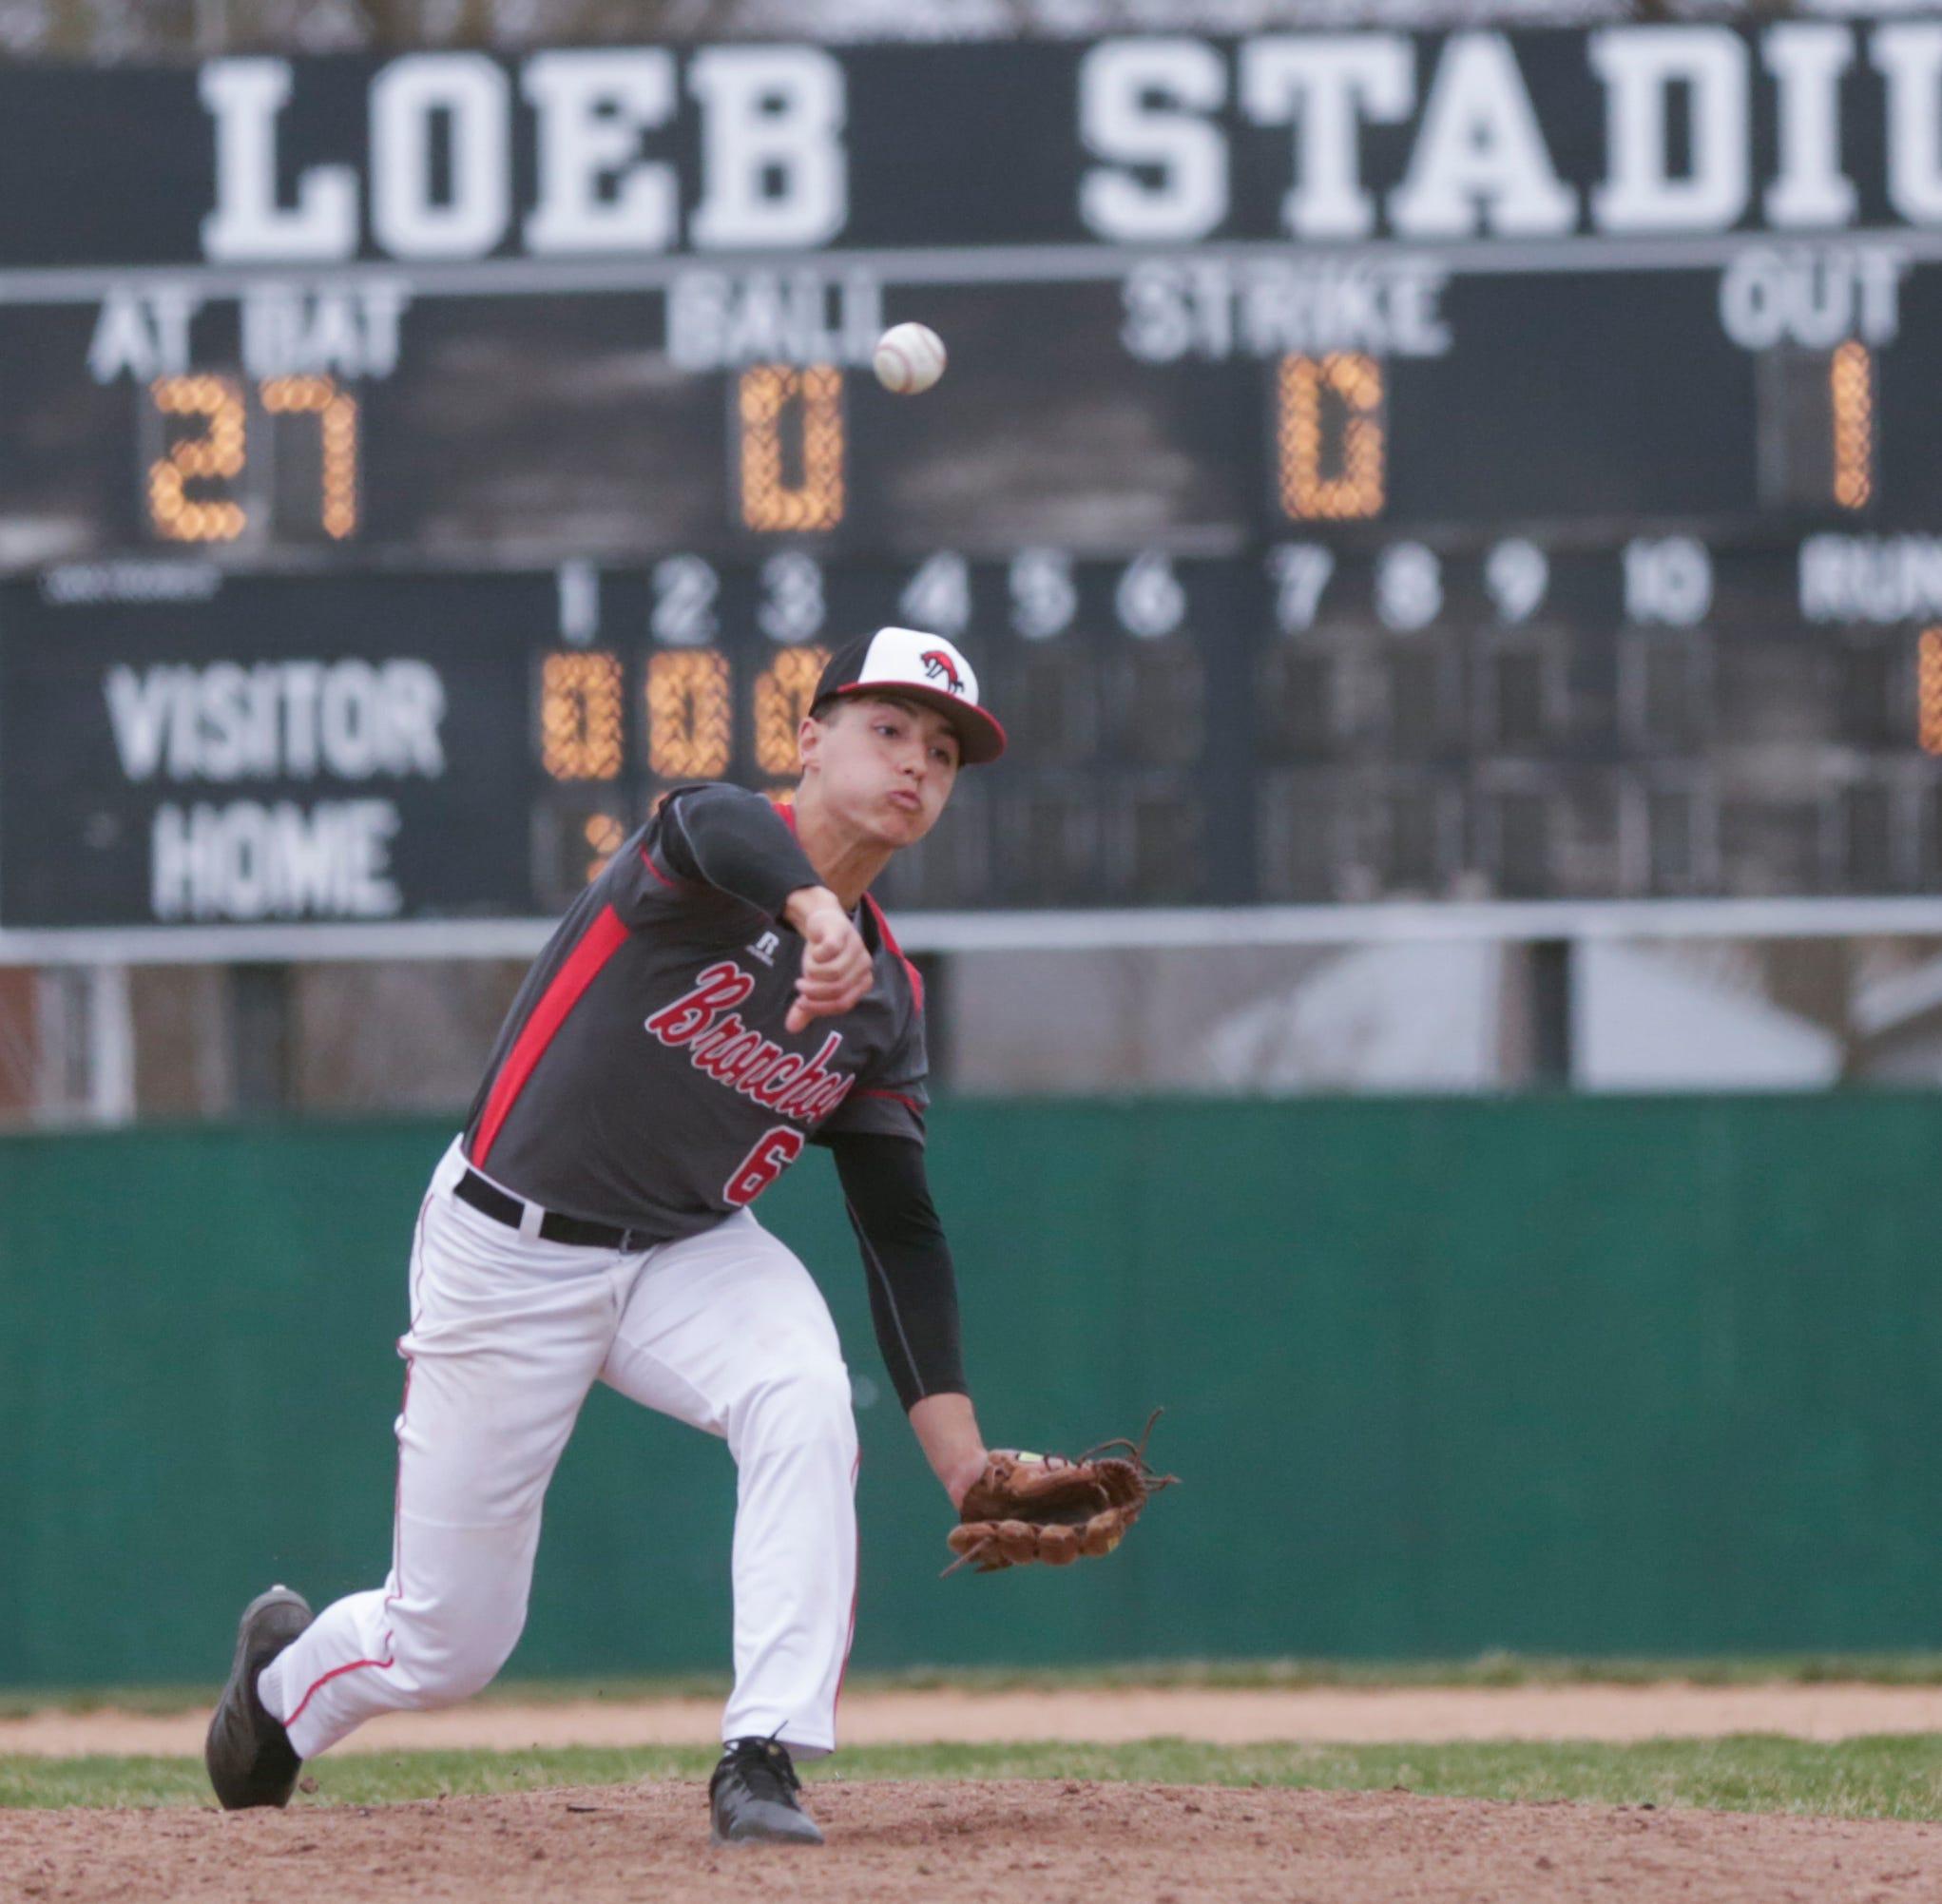 With Loeb Stadium demolition nearing, Lafayette Jeff baseball looks to add final memories